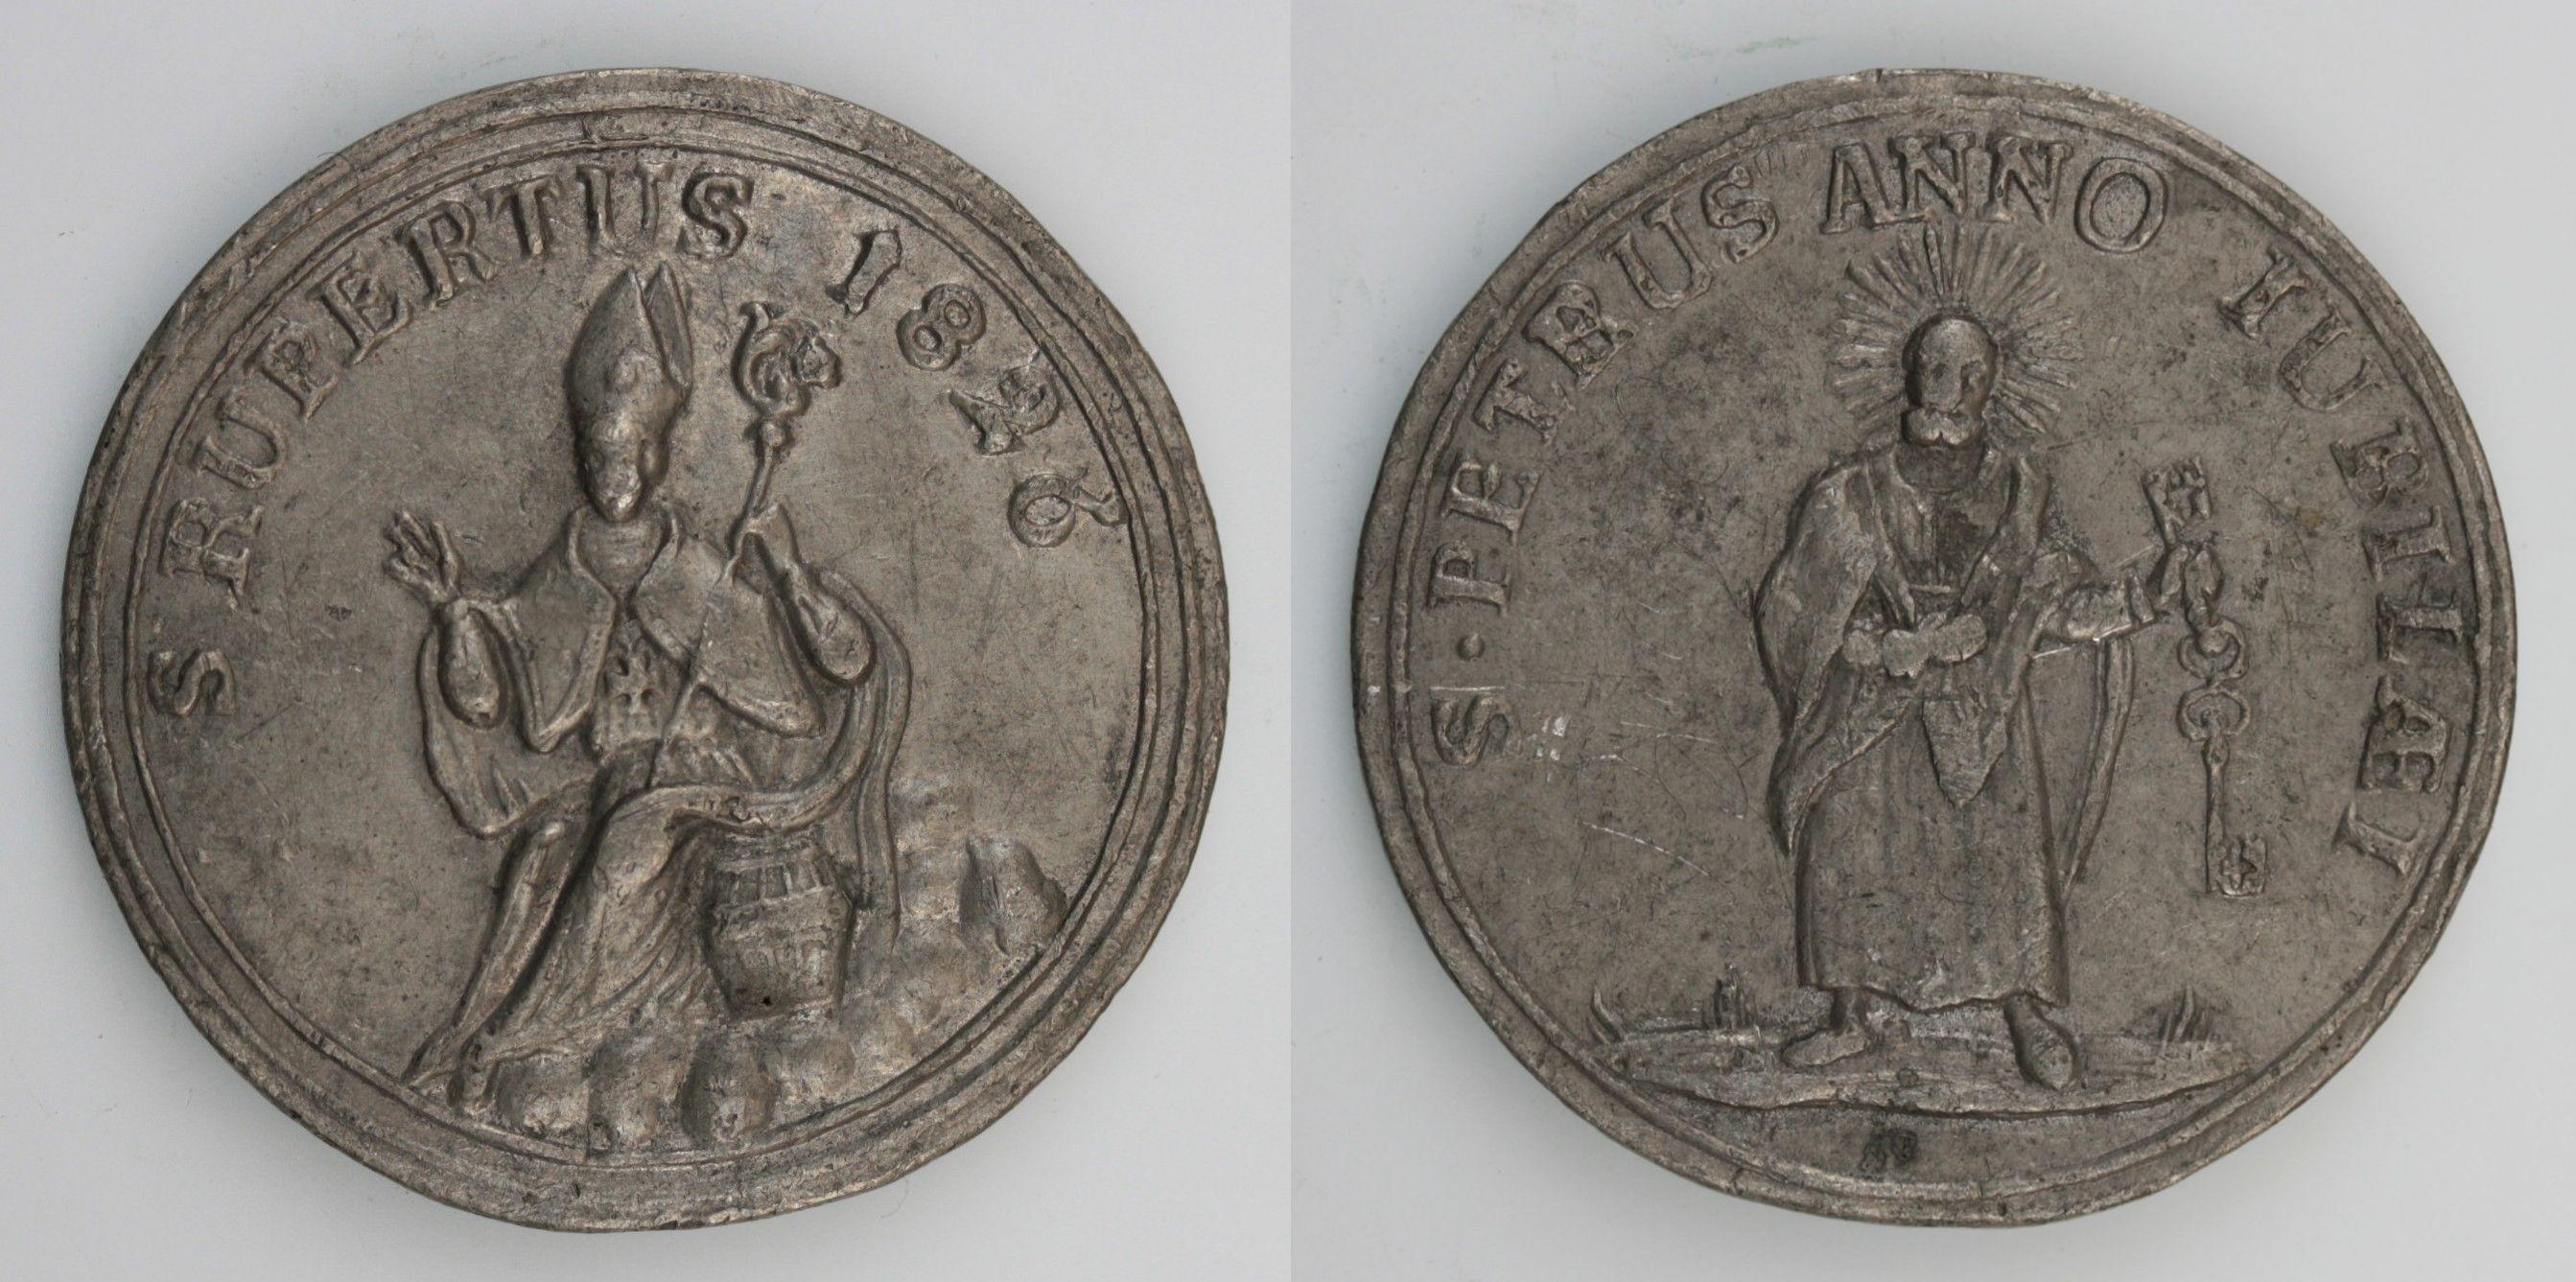 Papstjubiläum 1826